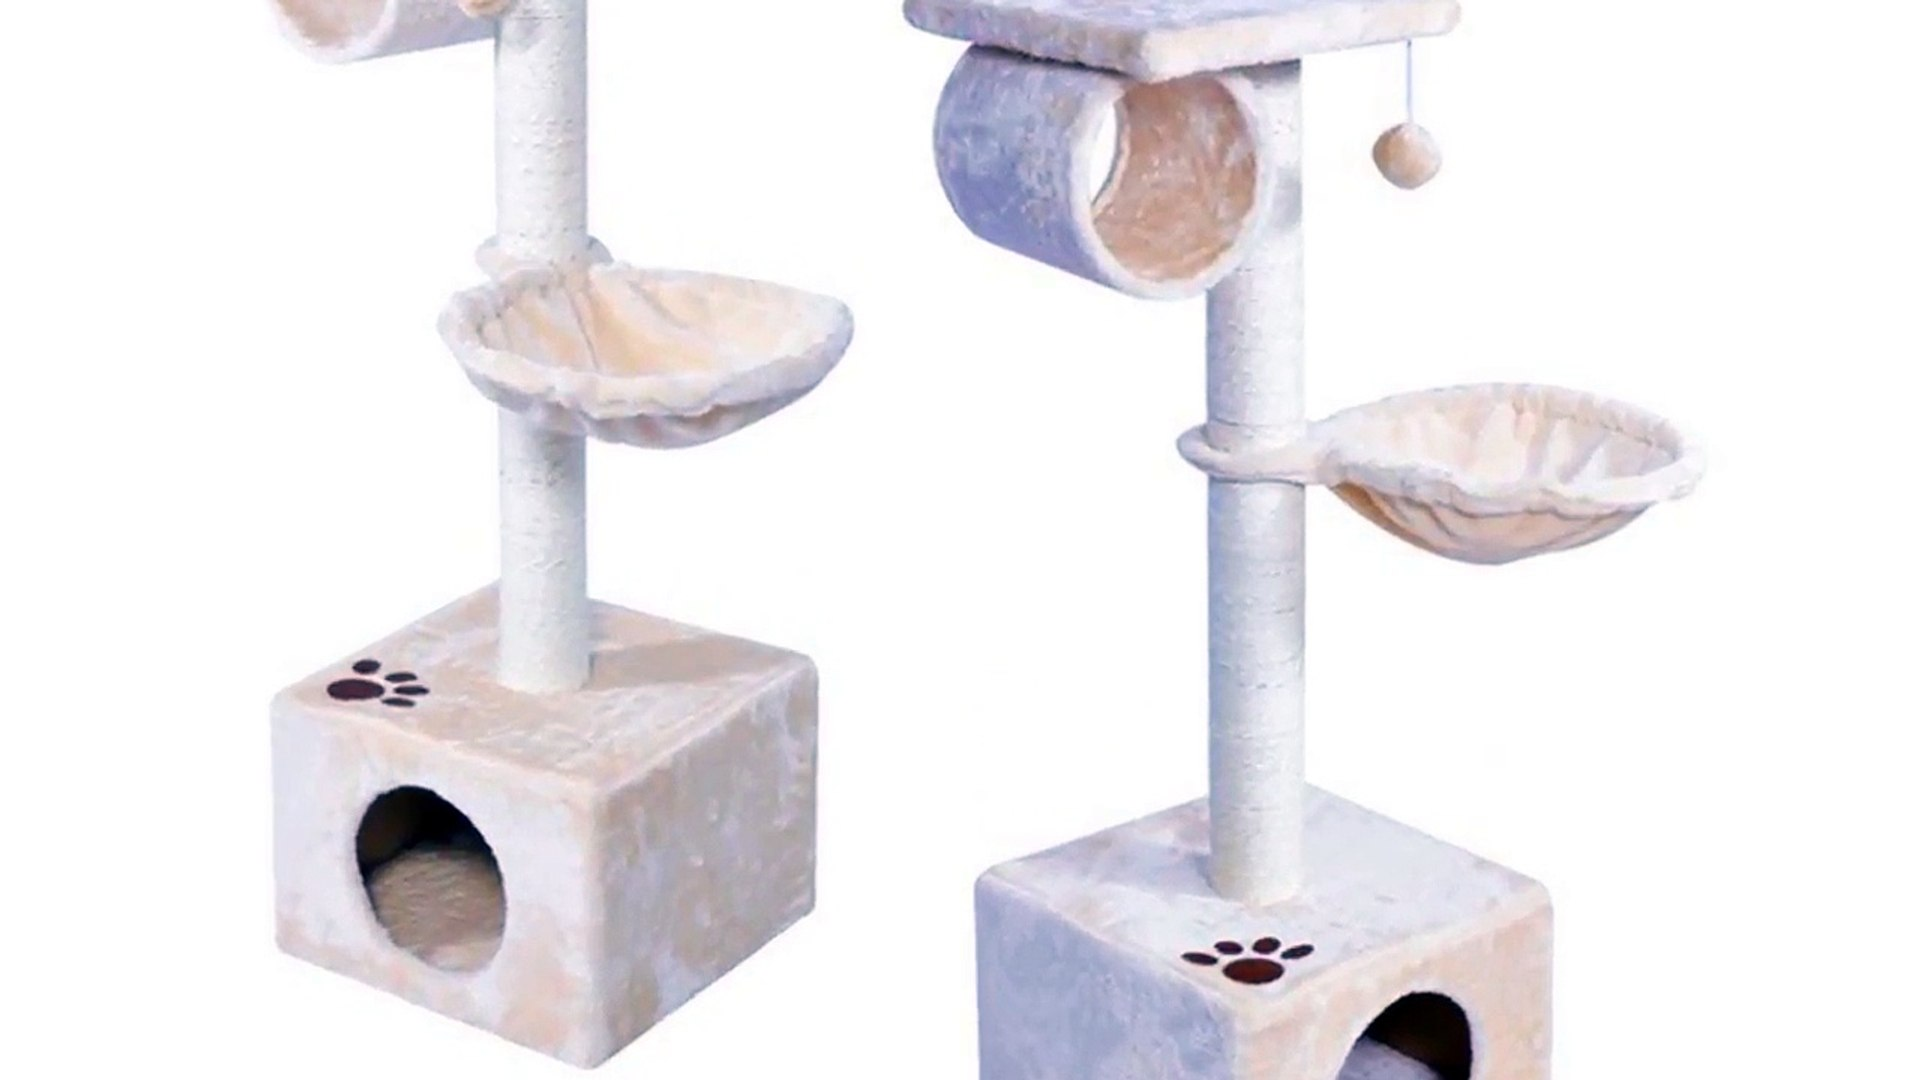 Cat tree factory: 60229 beige cat tree